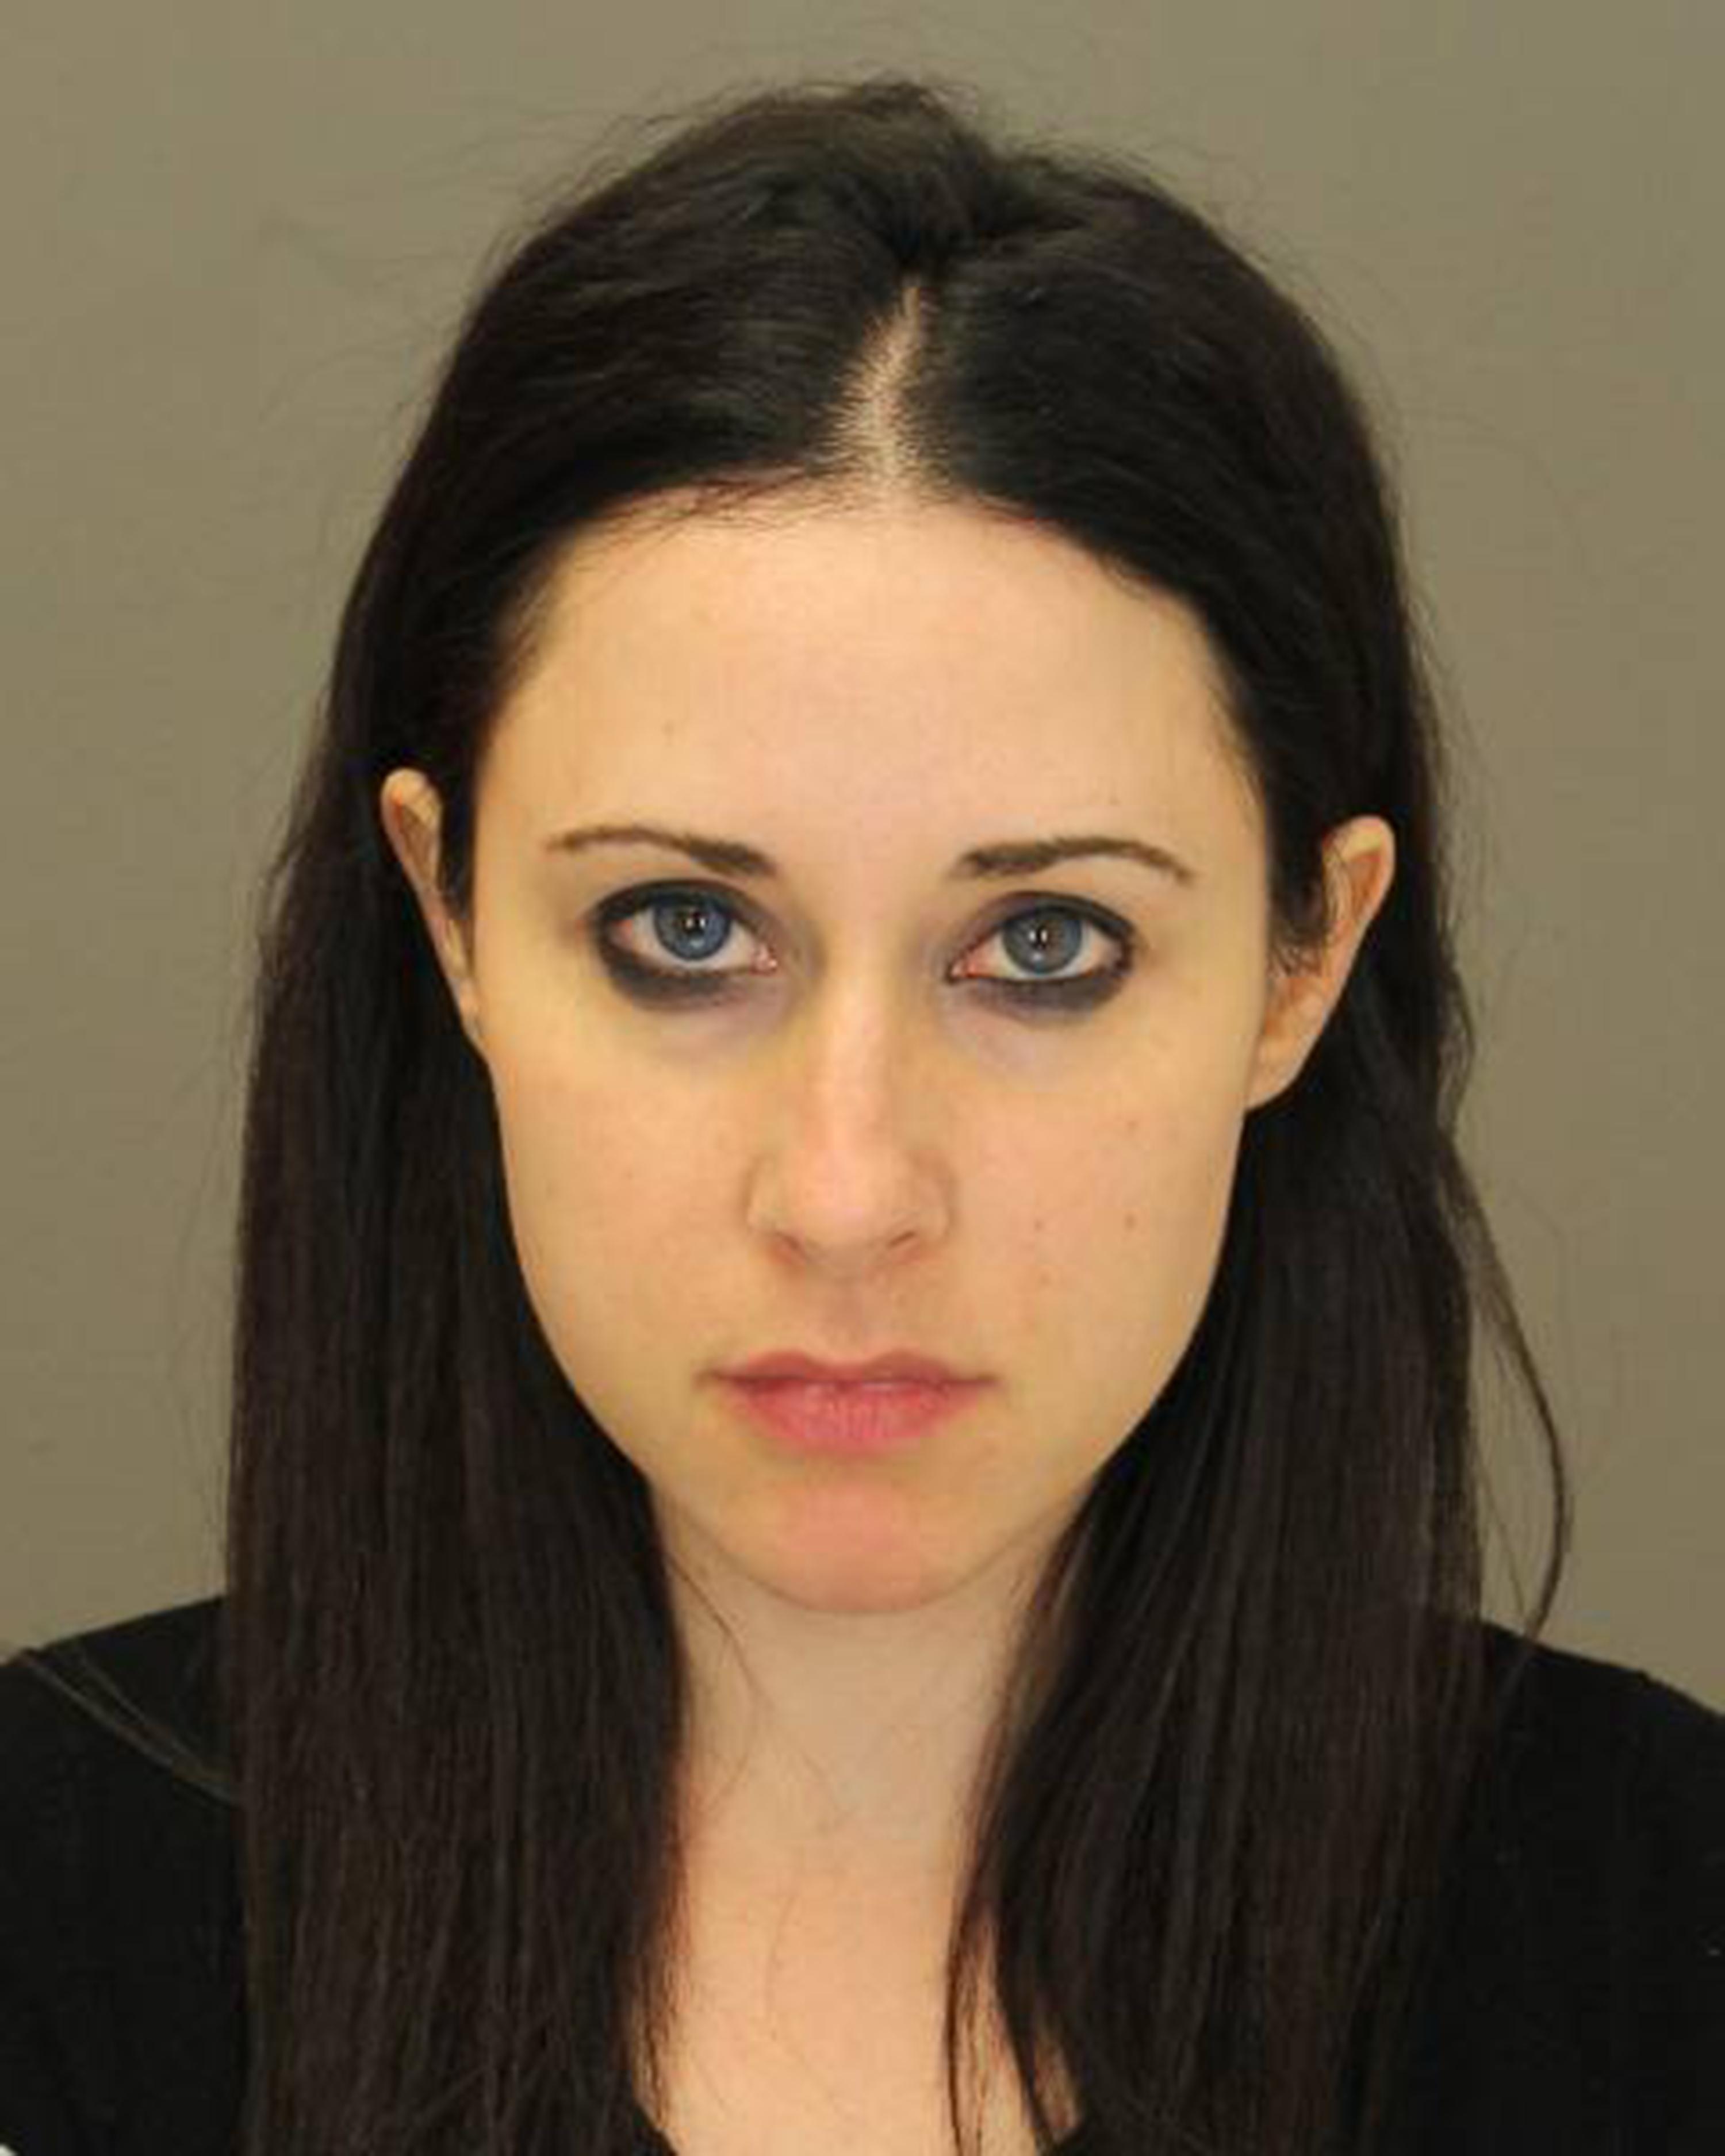 ny police podiatrist girlfriend plotted to kill man s wife ny police podiatrist girlfriend plotted to kill man s wife com